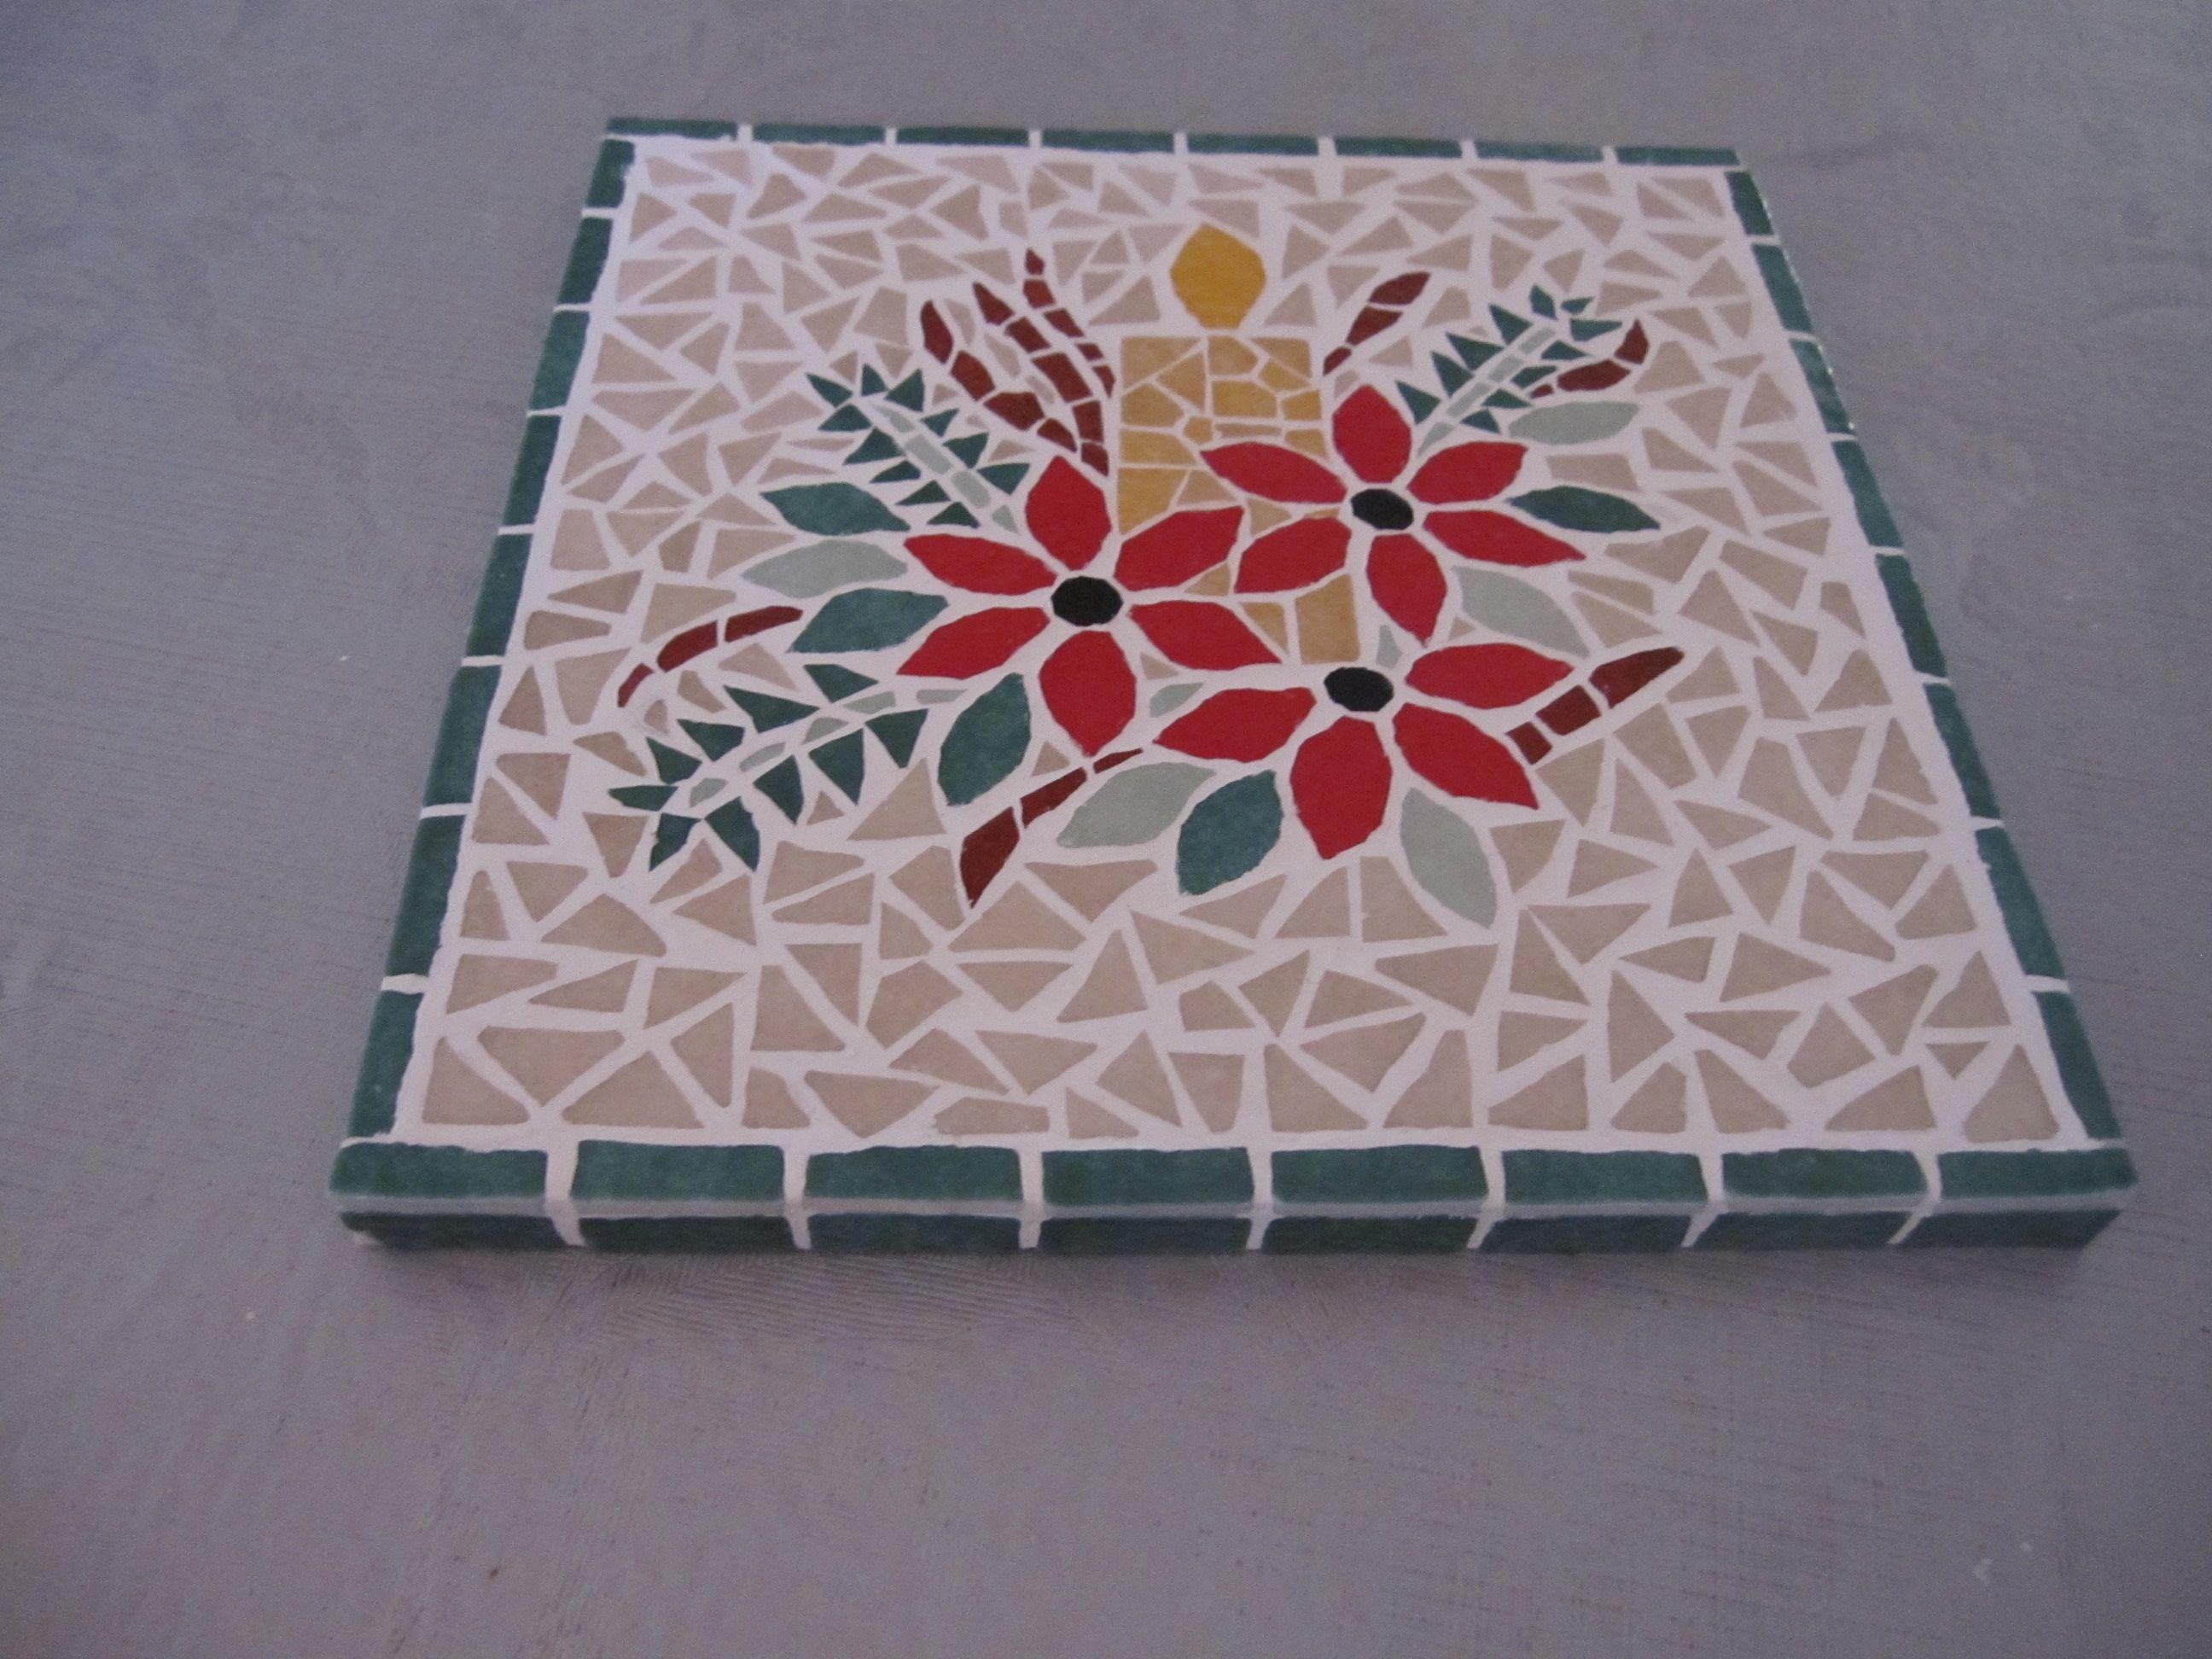 dessous de plat genti sculpture pinterest mosaics craft and creative. Black Bedroom Furniture Sets. Home Design Ideas